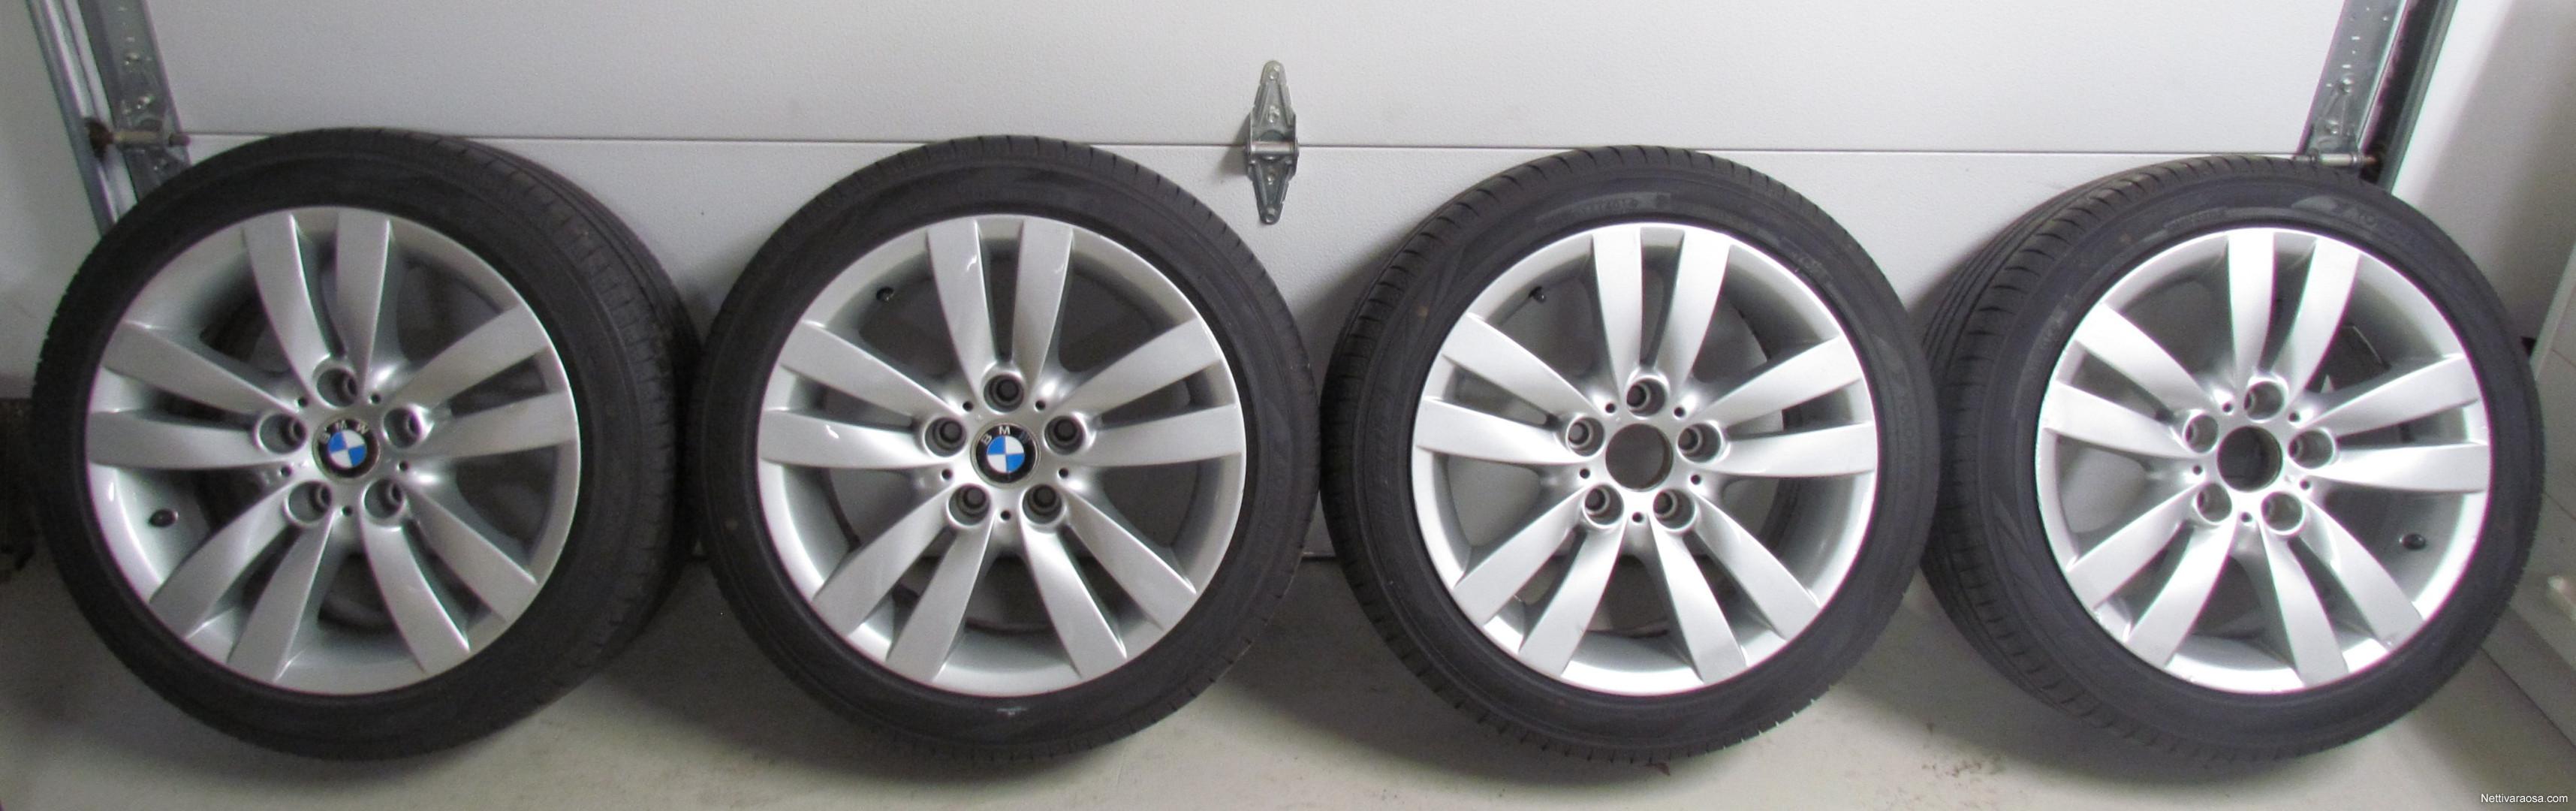 black oem machined rim wheel styles rear with bmw style